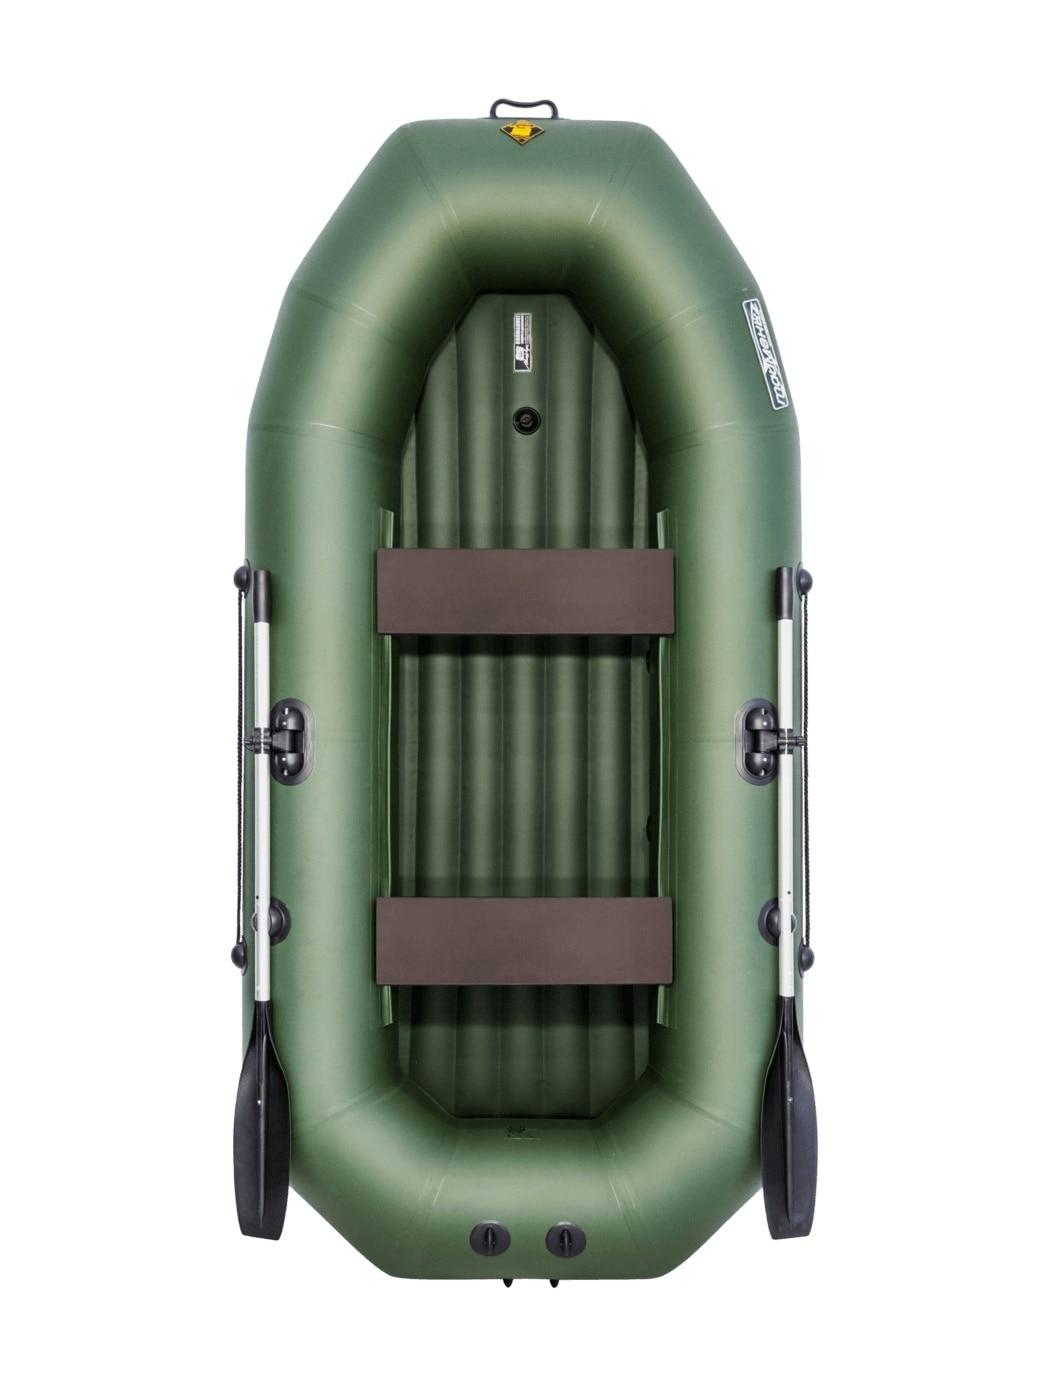 Inflatable Boat PVC, Tymen N 270 ND, Green 4603725300262